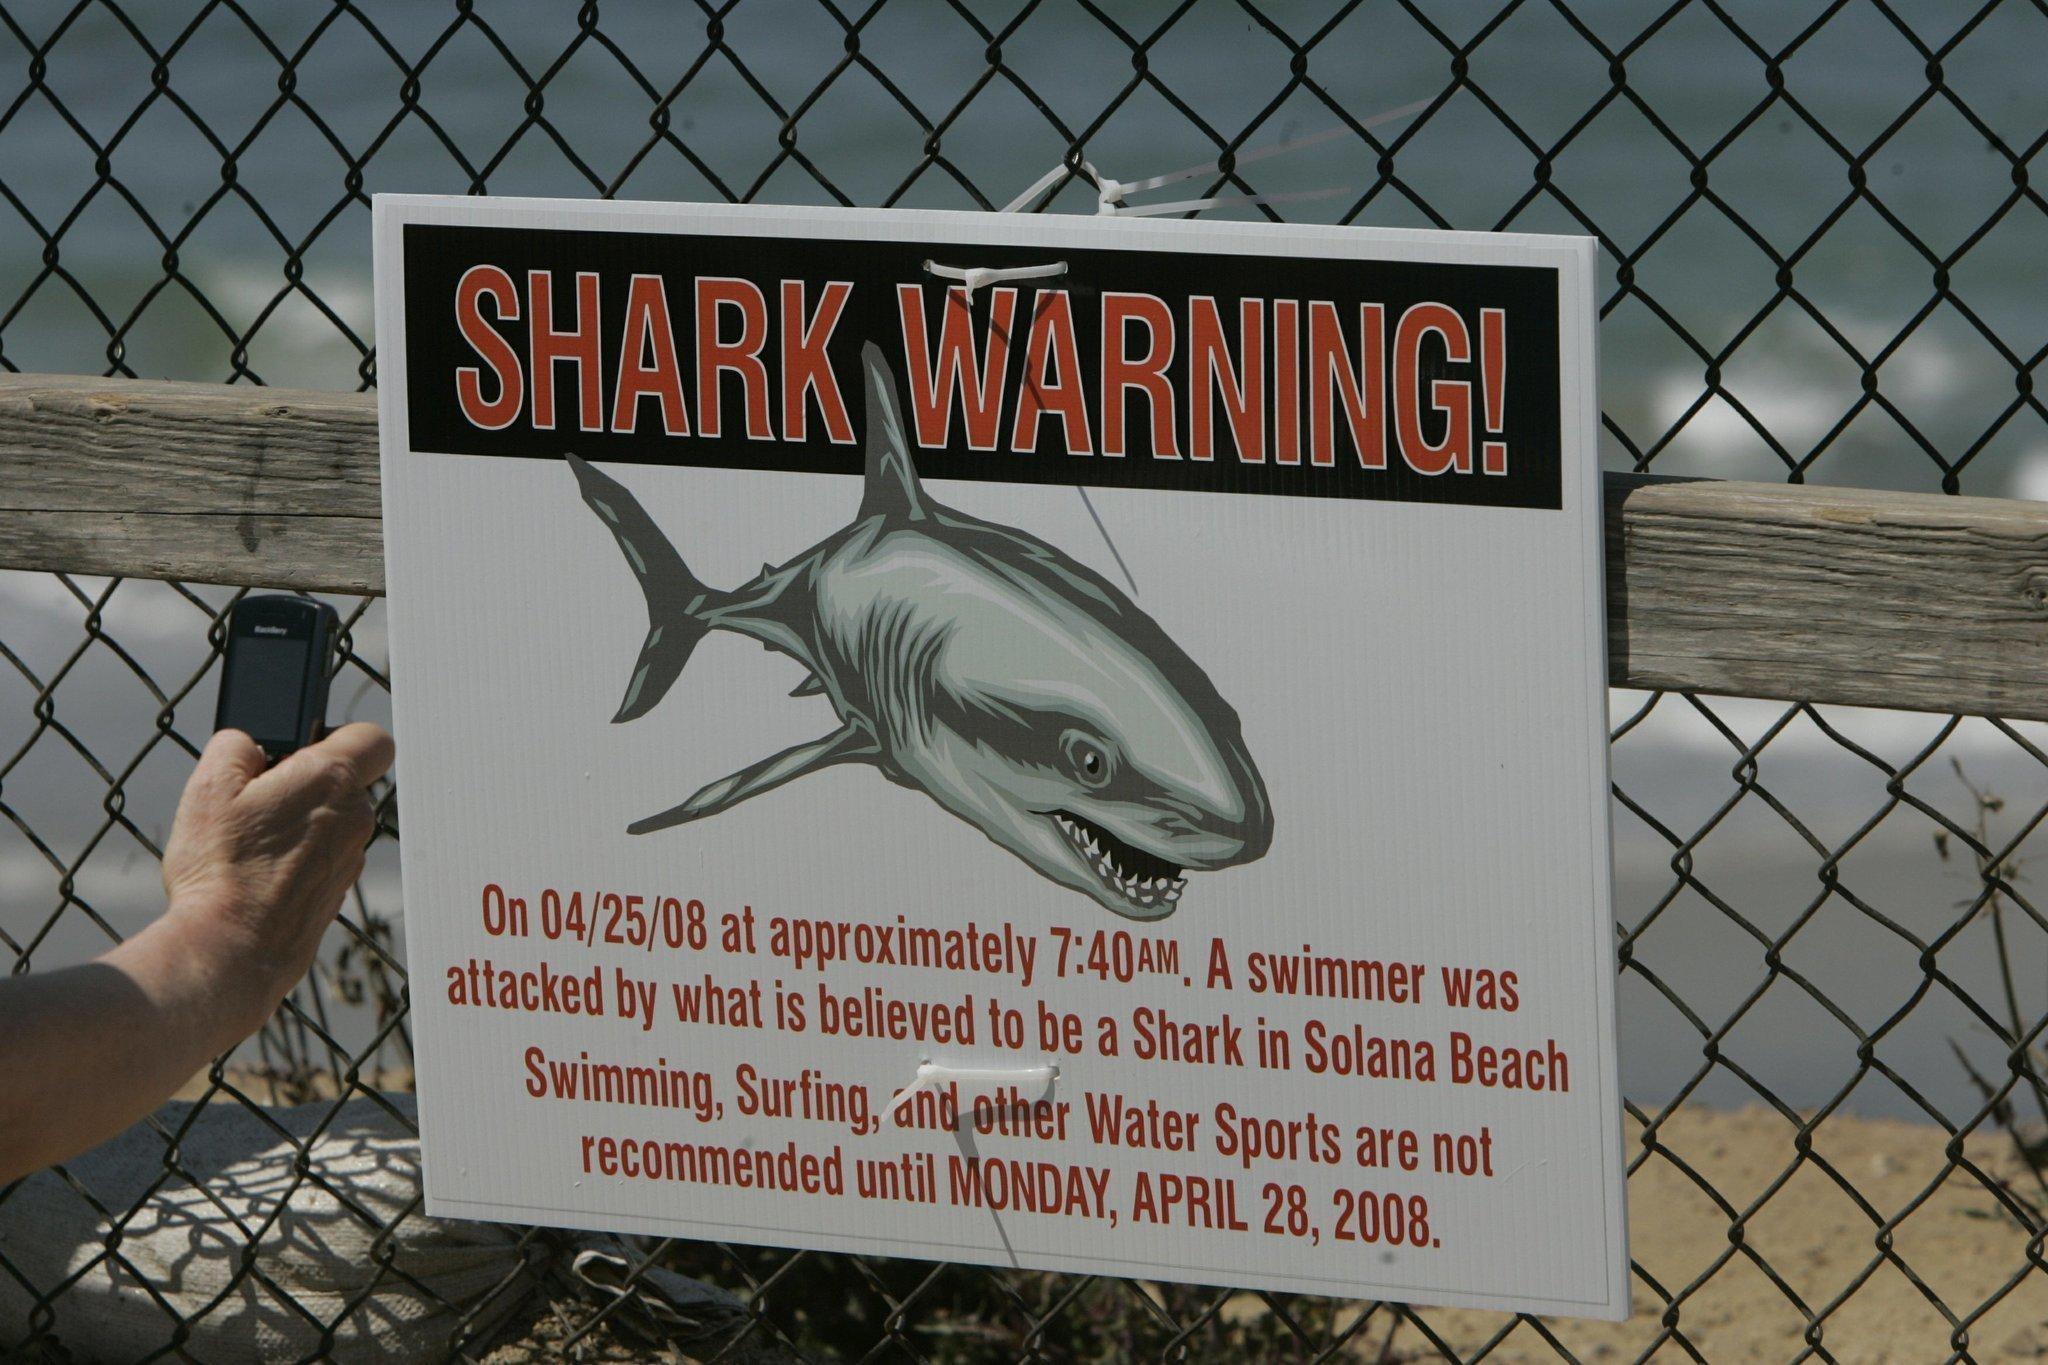 65 Years Of Shark Encounters In San Diego The San Diego Union Tribune